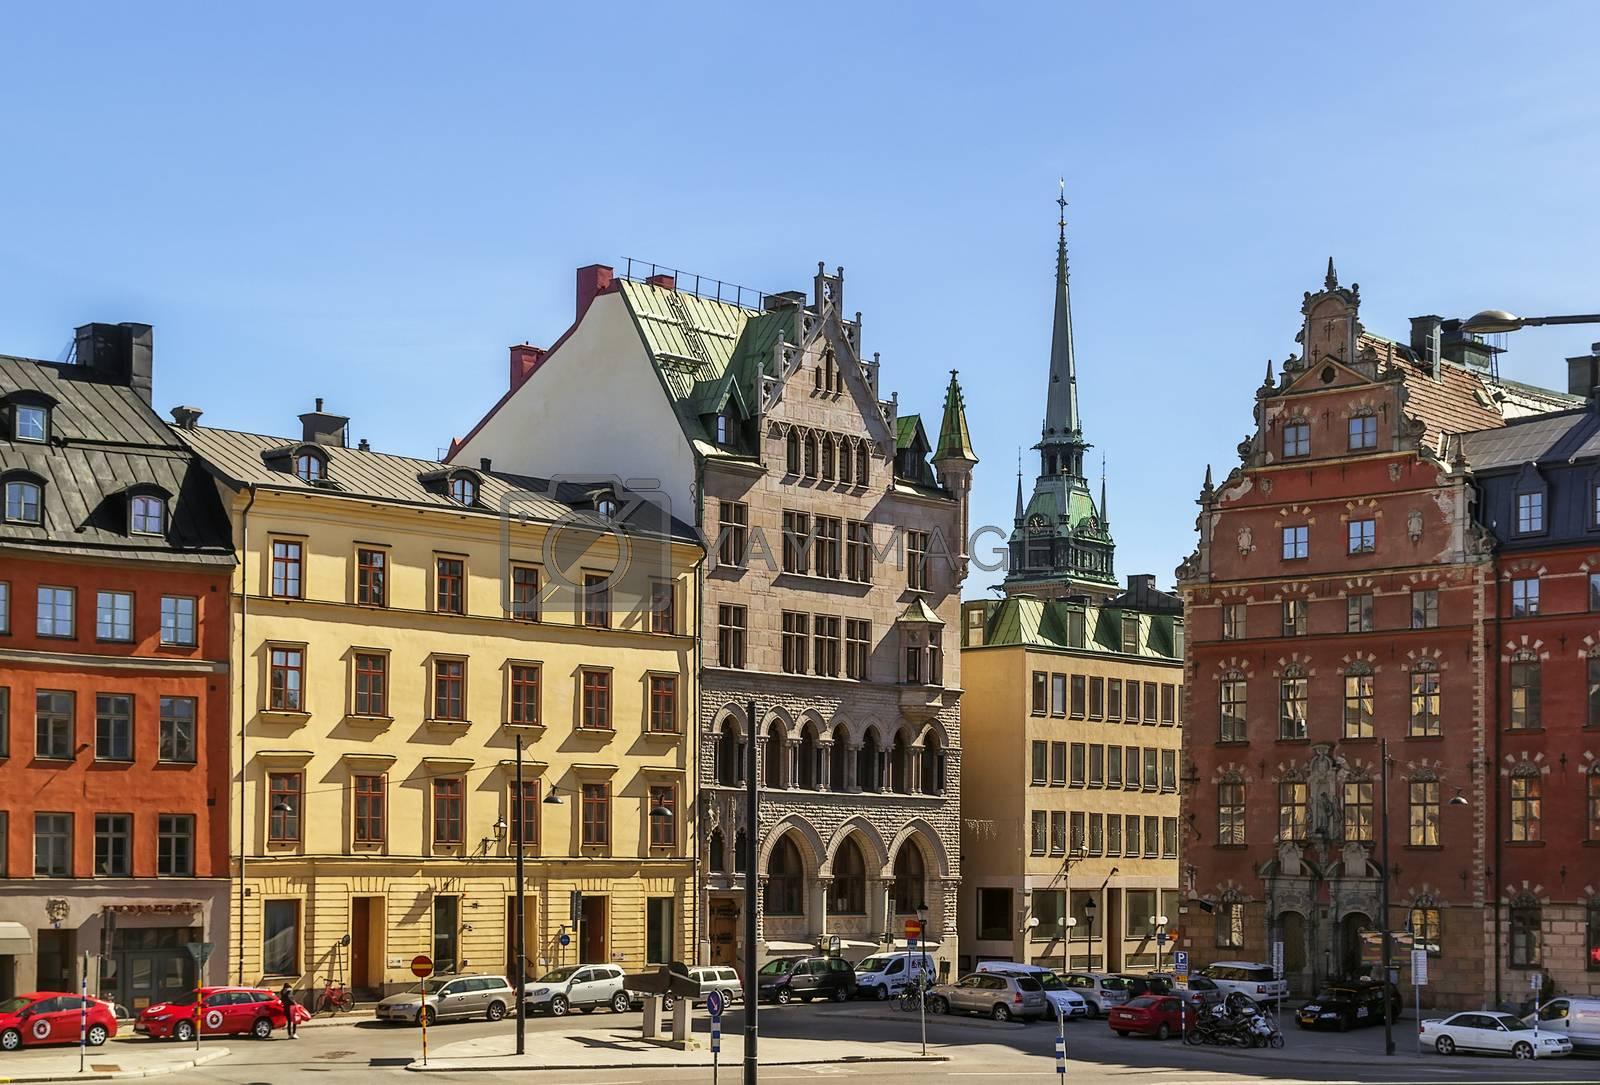 Square in Gamla Stan, Stockholm by borisb17